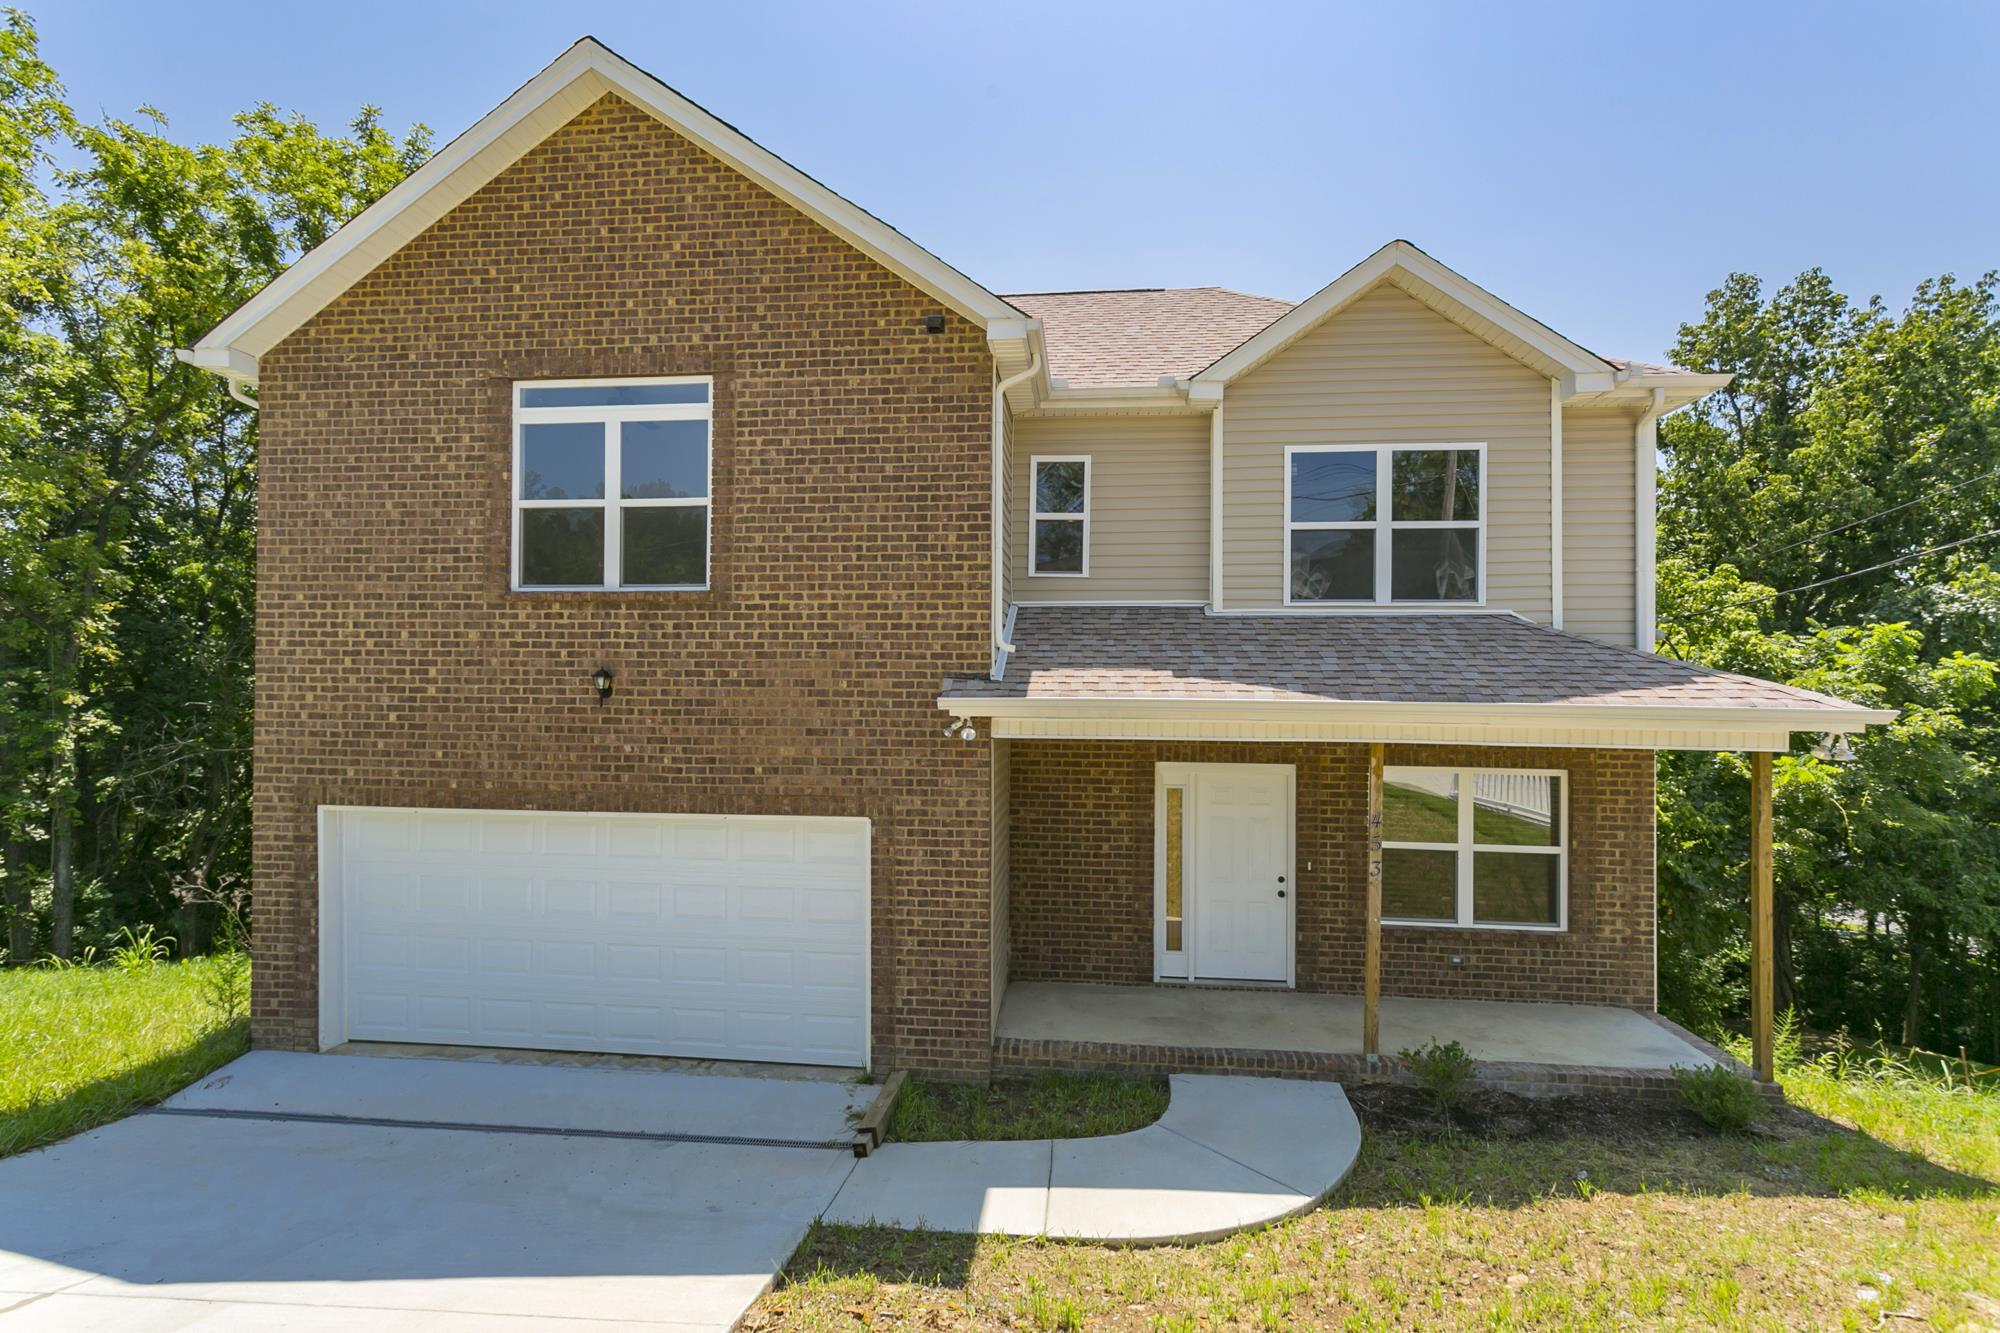 453 London Ct, Antioch, TN 37013 - Antioch, TN real estate listing